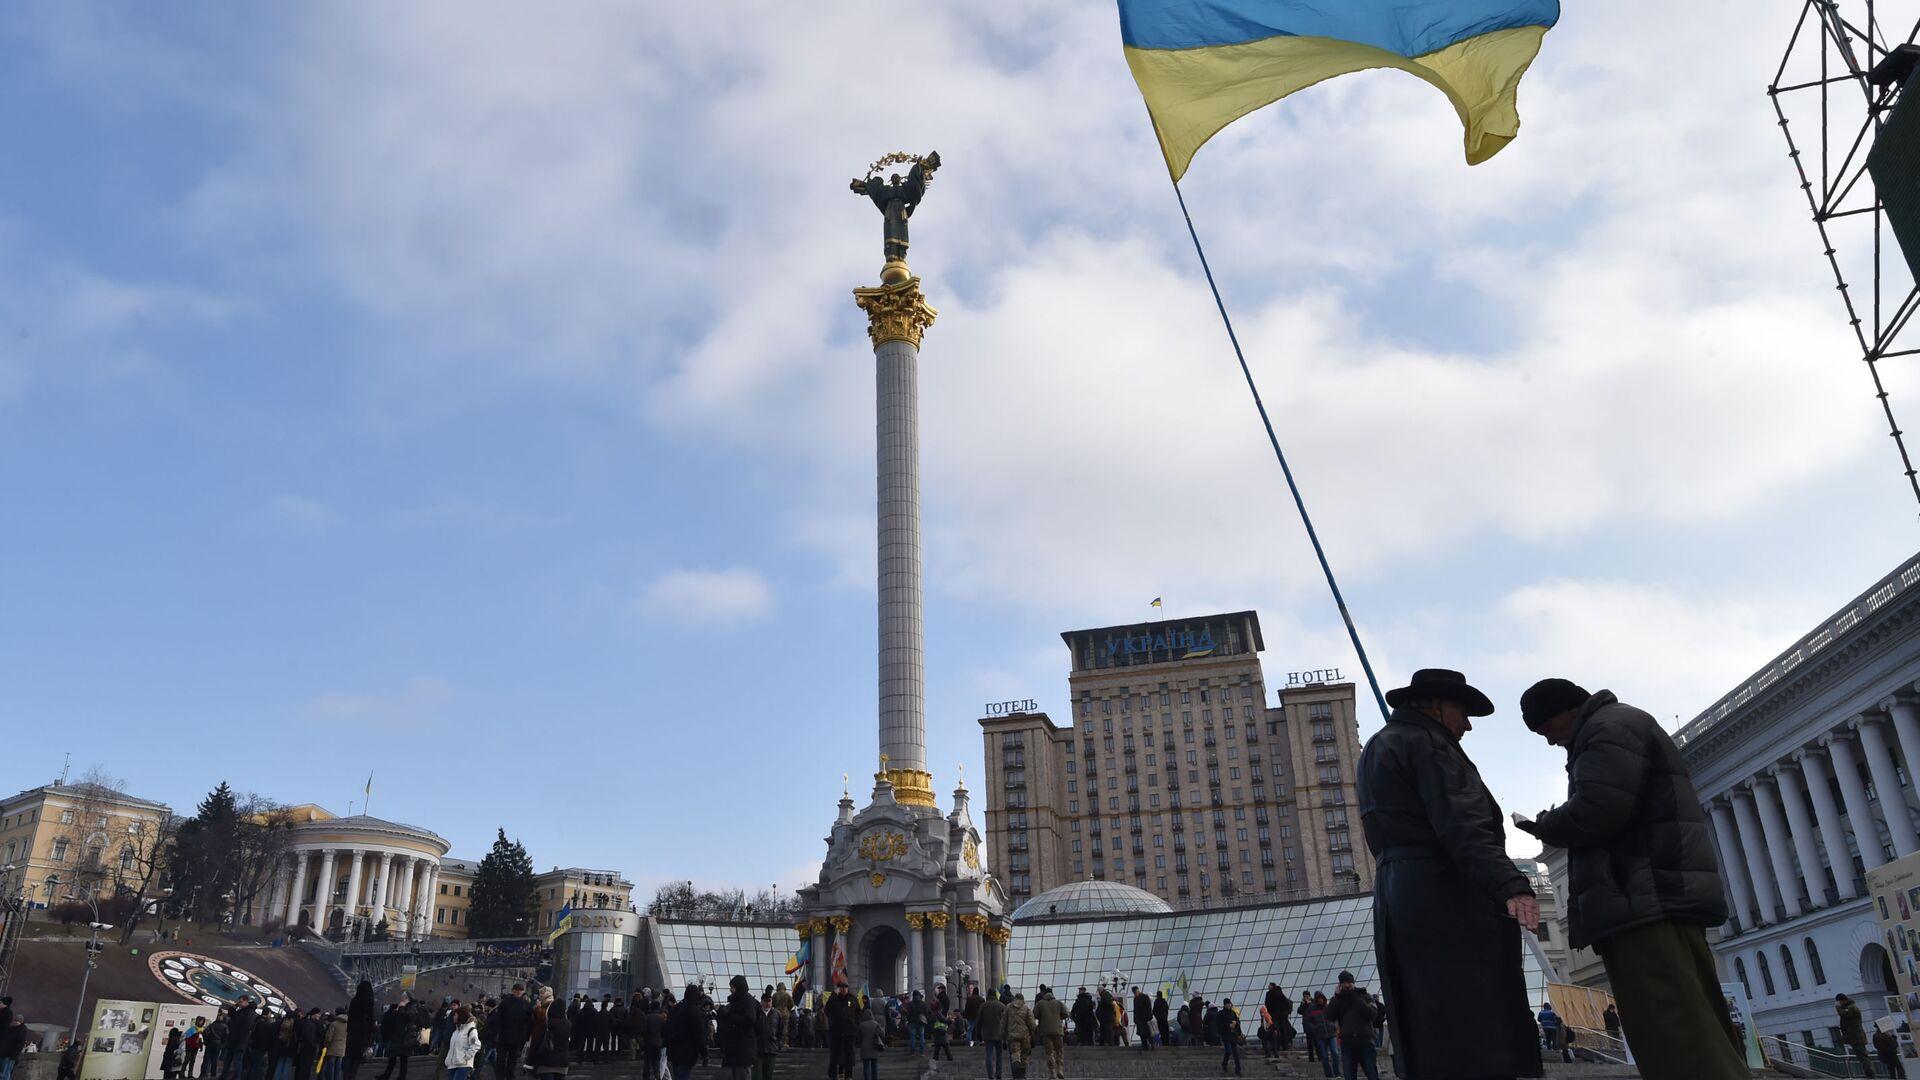 Украинский флаг на площади Независимости в Киеве - Sputnik Узбекистан, 1920, 05.09.2021